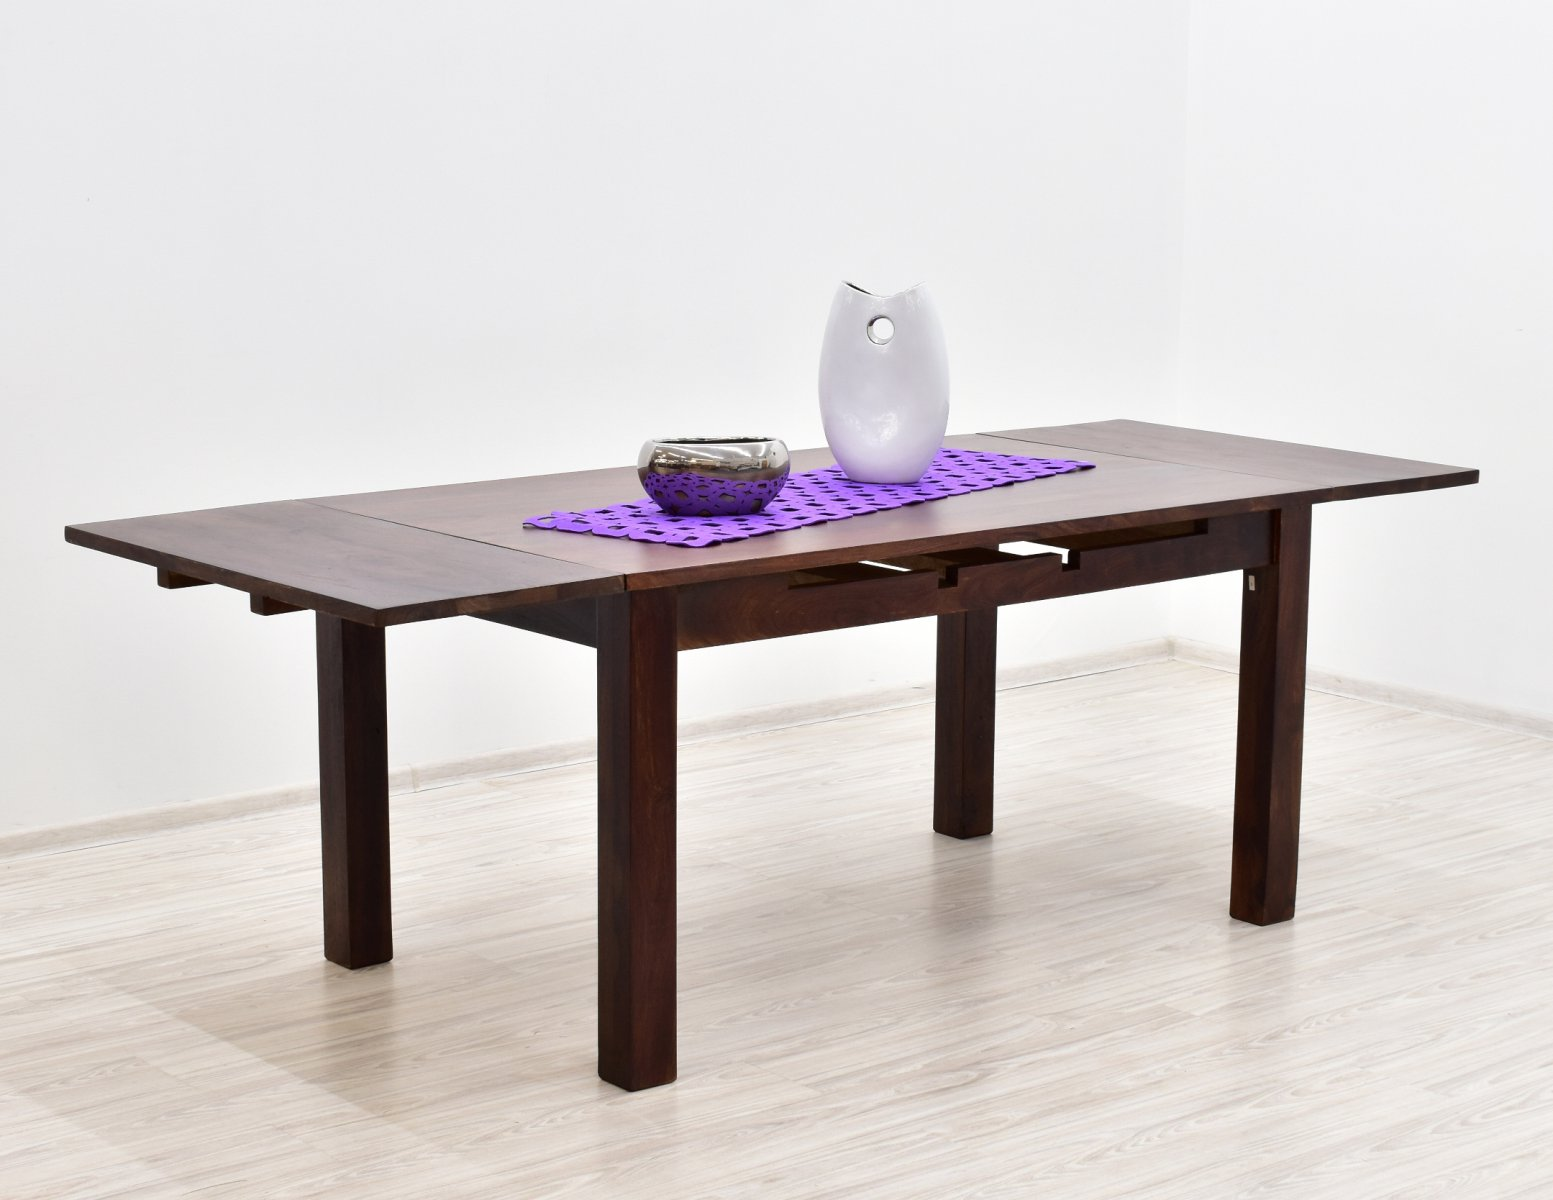 stol-kolonialny-rozkladany-lite-drewno-palisander-indyjski-ciemny-braz-klasyczny-masywny